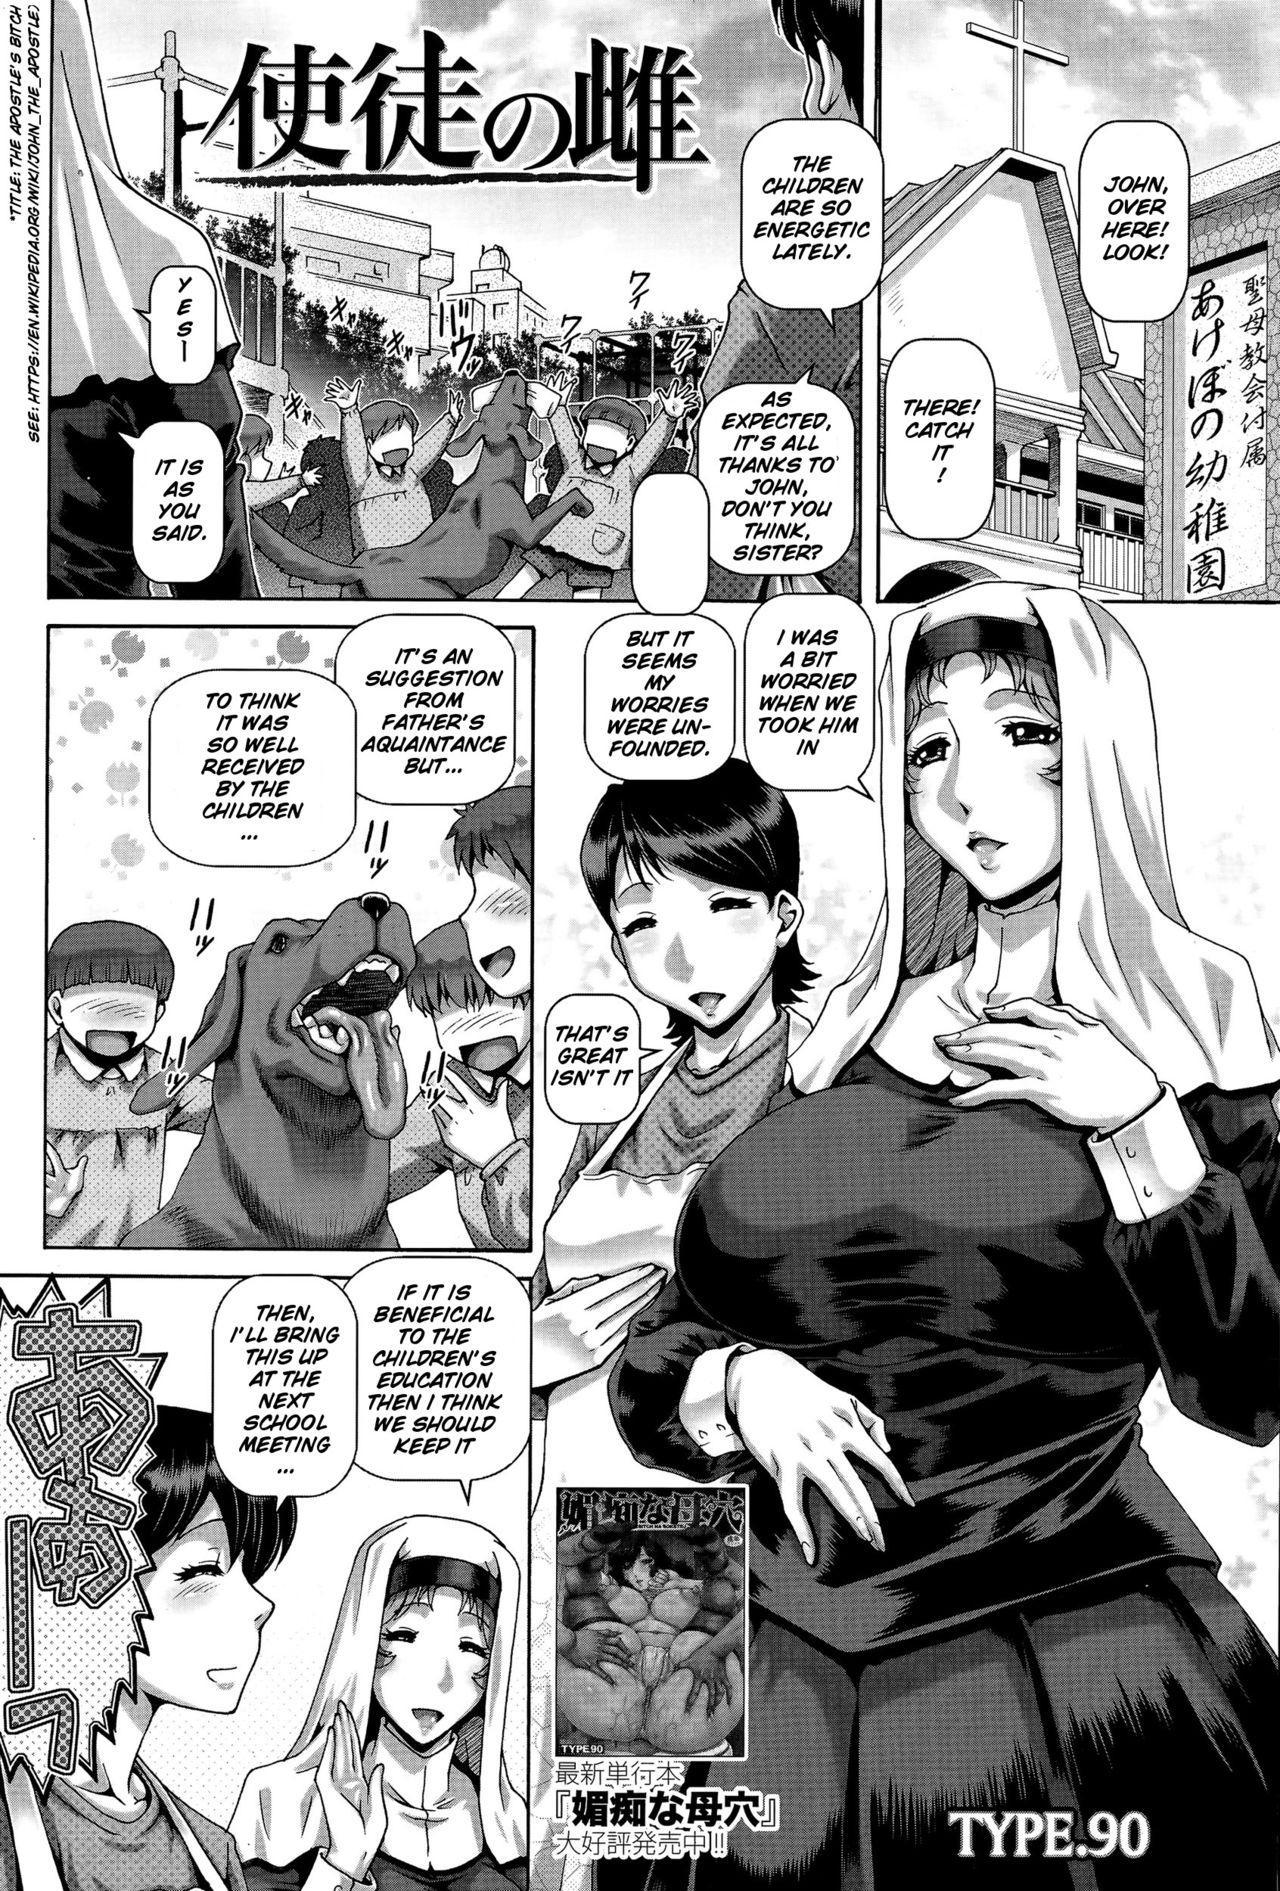 Shito no Mesu - The Apostle's Bitch 0